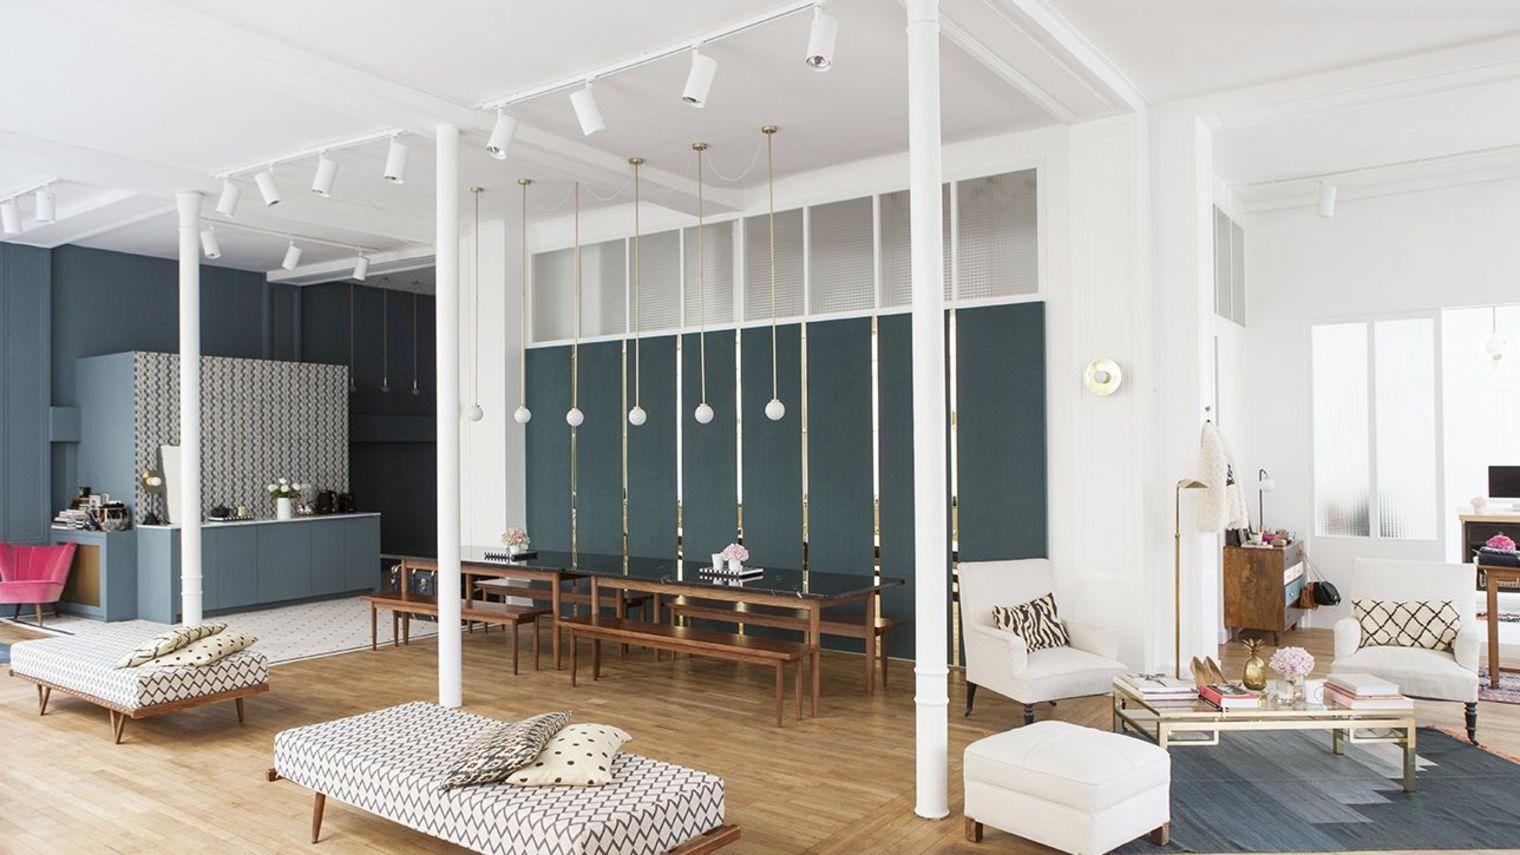 appartement louer j engage un agent immobilier. Black Bedroom Furniture Sets. Home Design Ideas